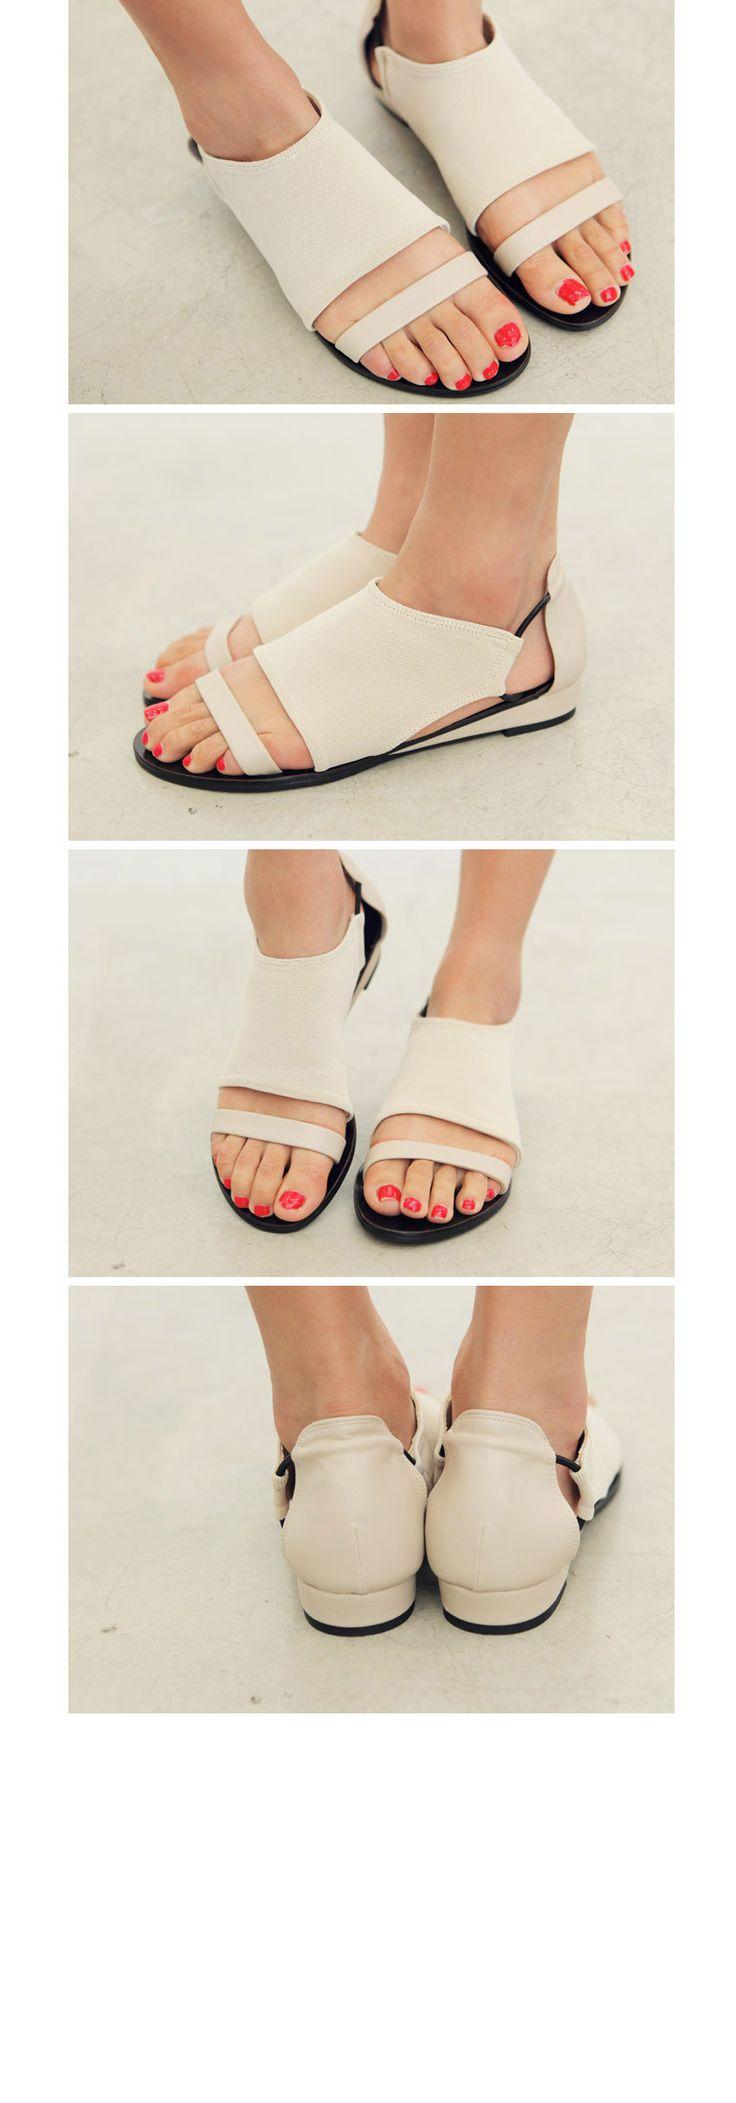 Paris Fashion Week SS14 Runway Shoes   Spring shoe trend